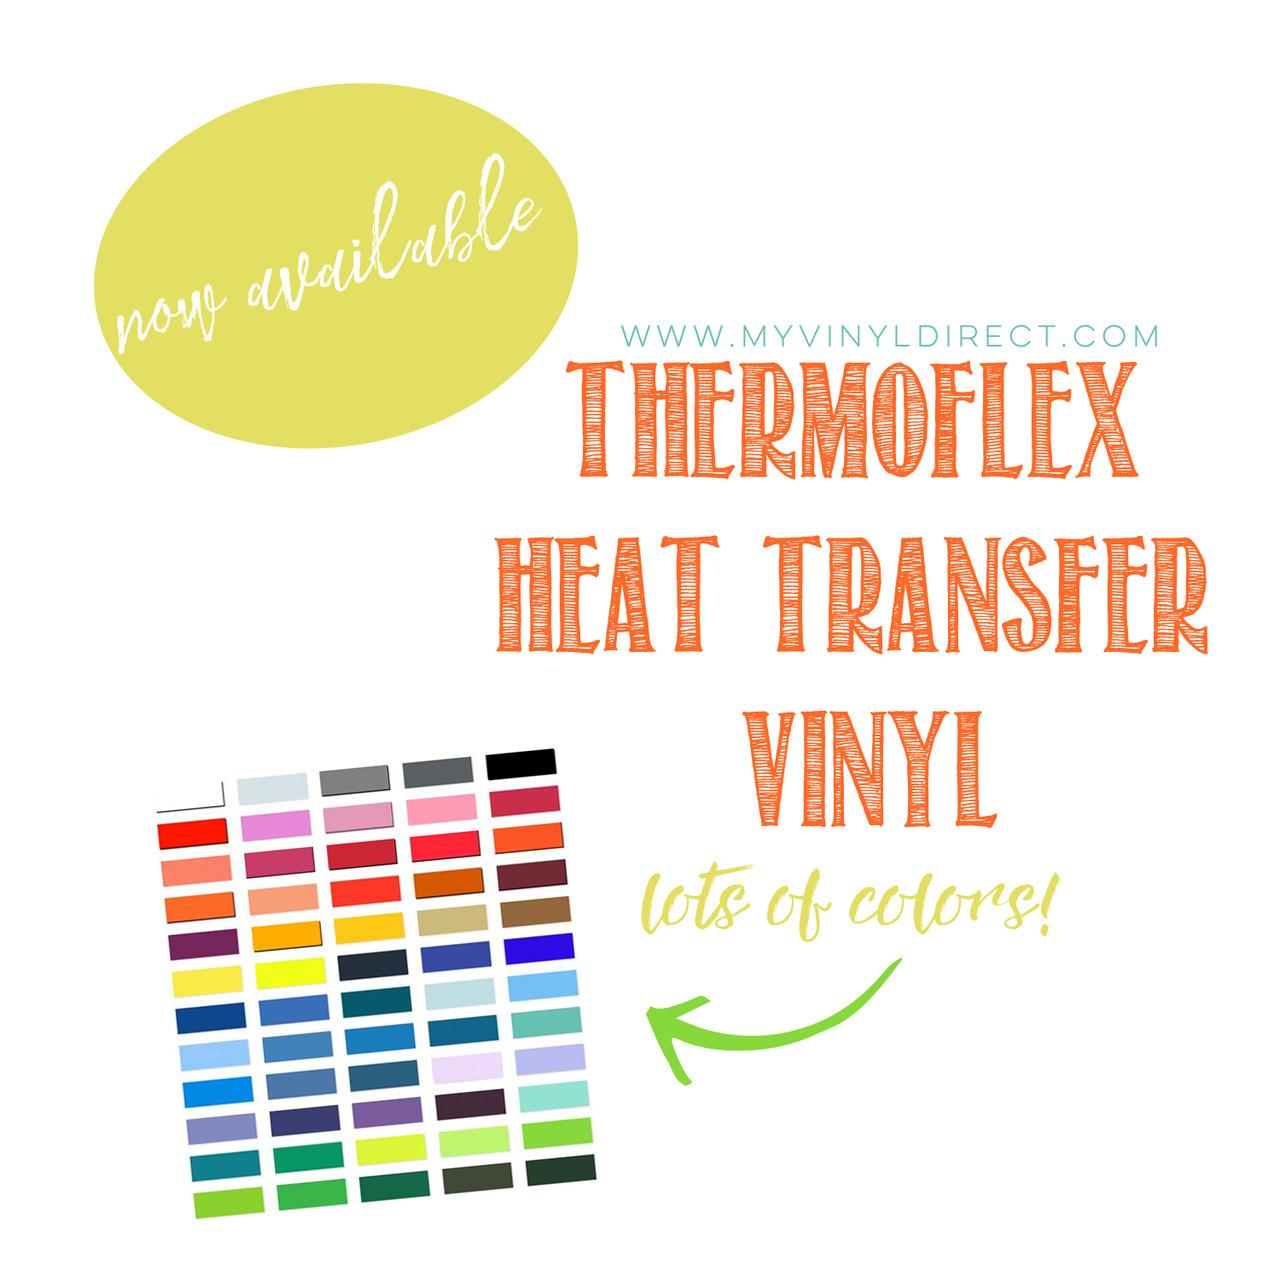 Thermoflex Plus Heat Transfer Vinyl Sheet My Vinyl Direct